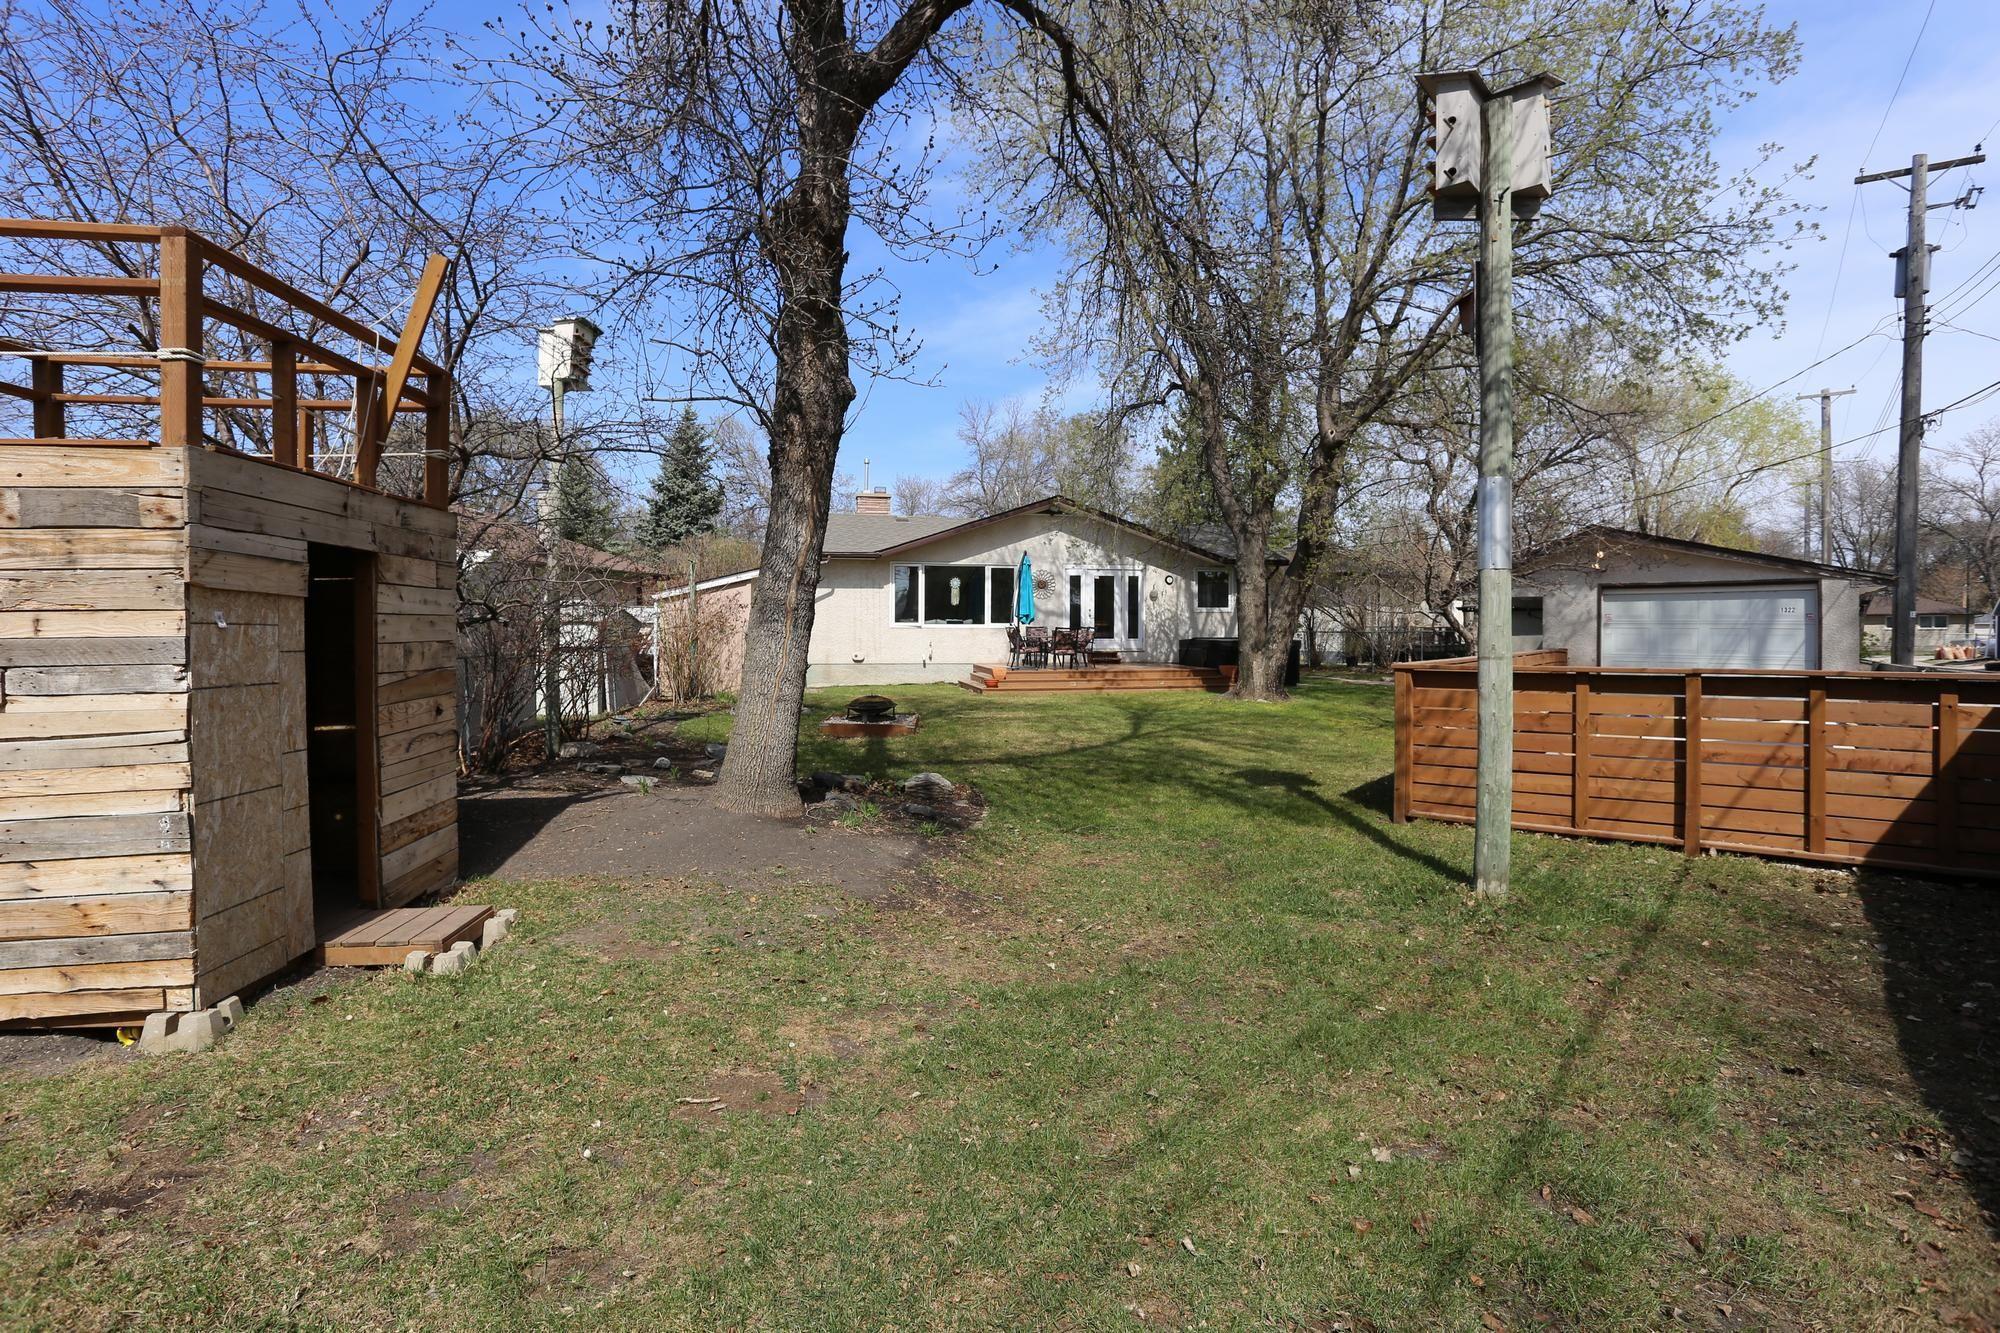 Photo 30: Photos: 1322 Valour Road in Winnipeg: Sargent Park Single Family Detached for sale (5C)  : MLS®# 1811835